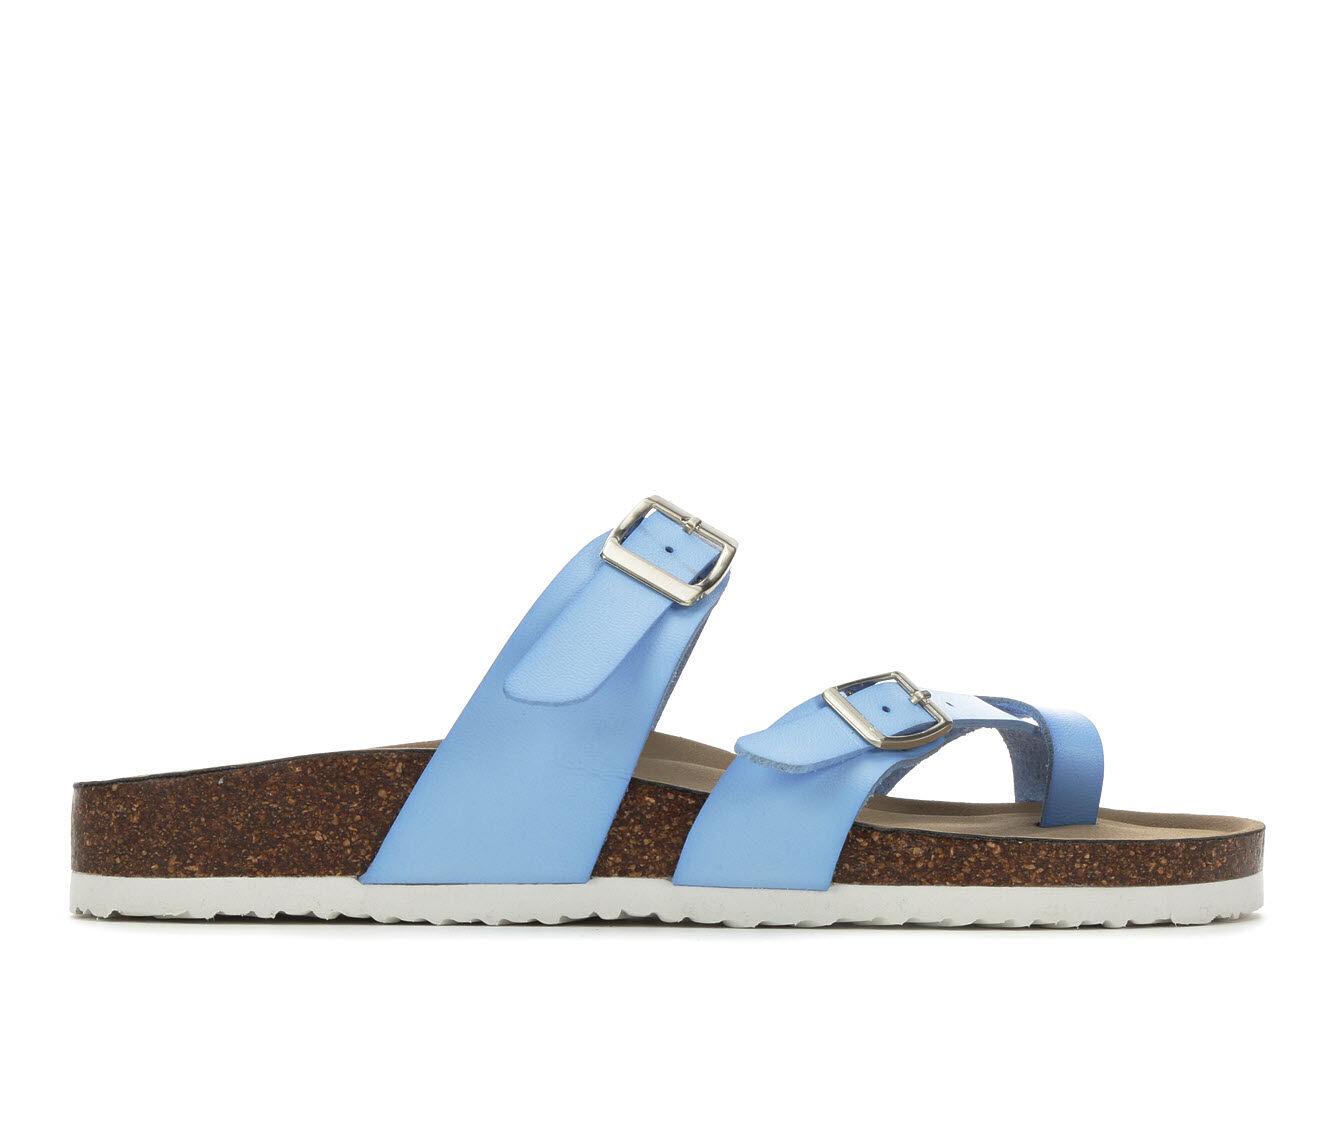 Women's Madden Girl Bryceee Footbed Sandals Brt Blue/White